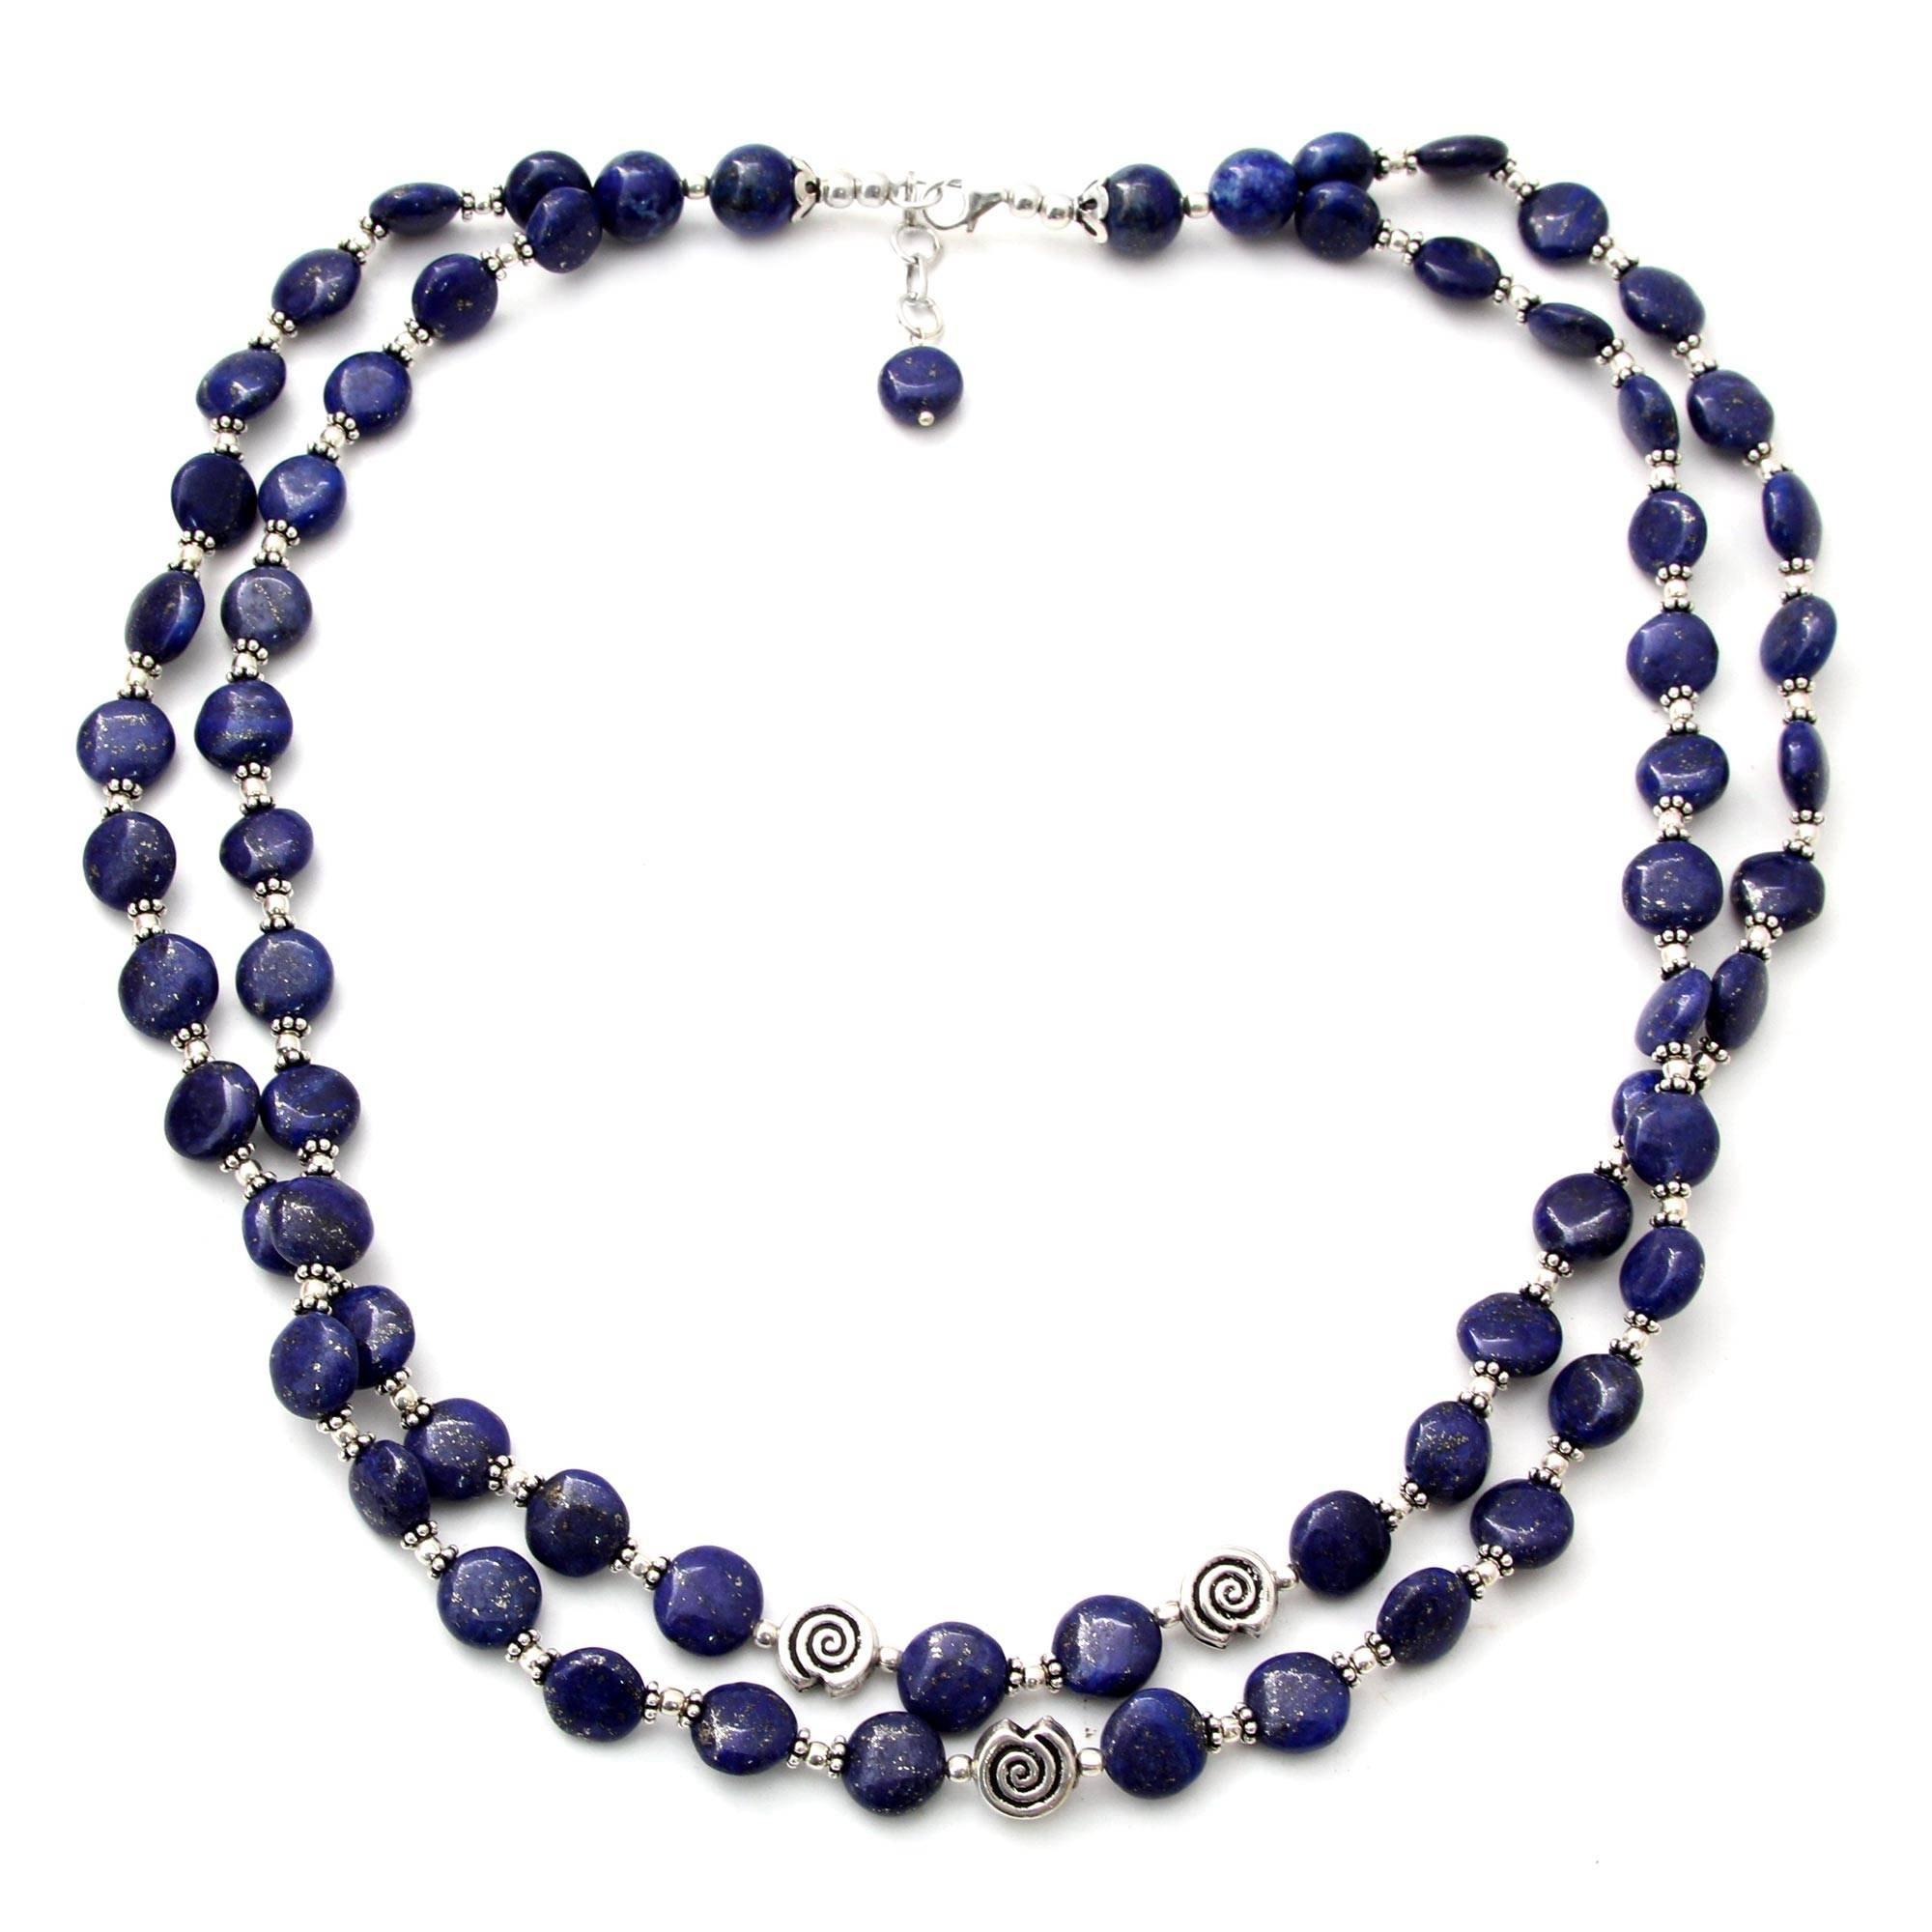 NOVICA Lapis Lazuli .925 Sterling Silver Beaded Strand Necklace 'Midnight Breeze'